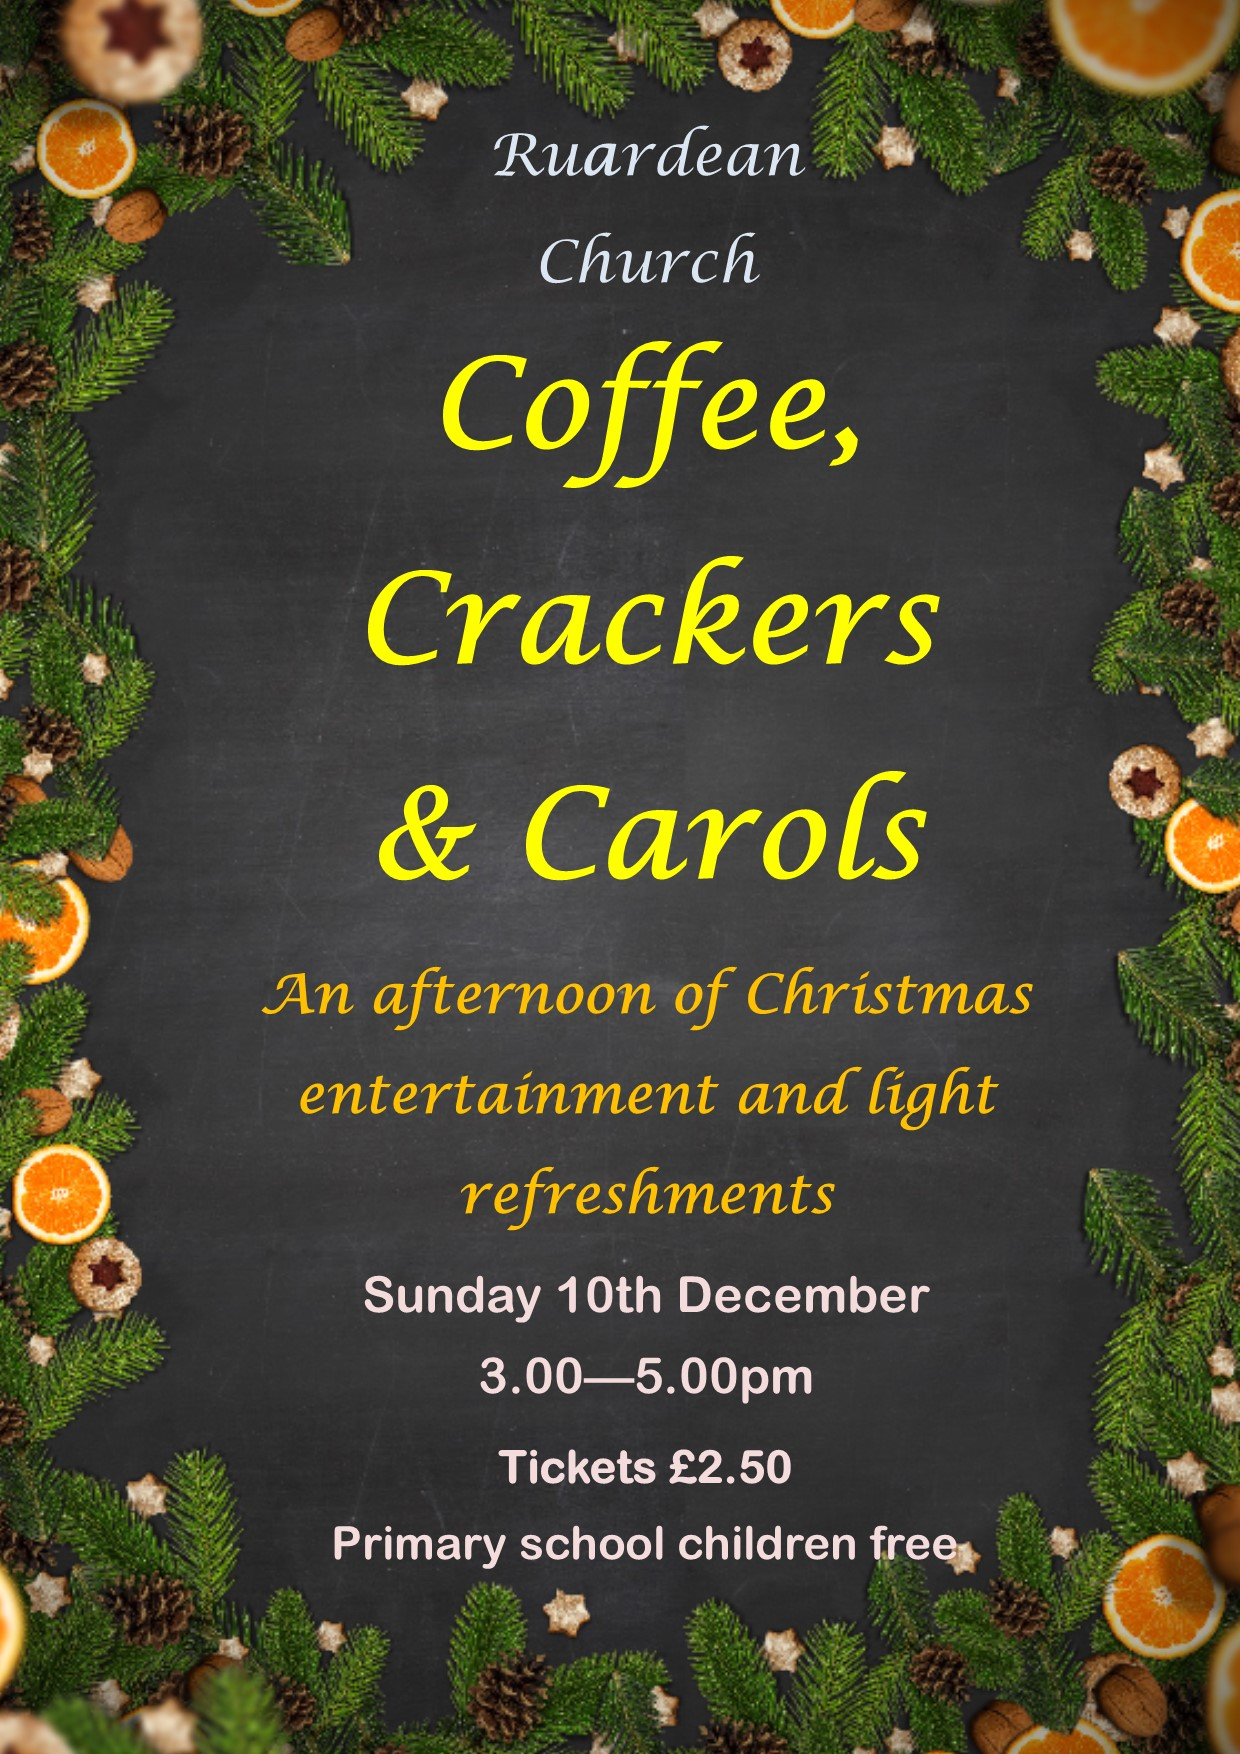 Crackers & Carols